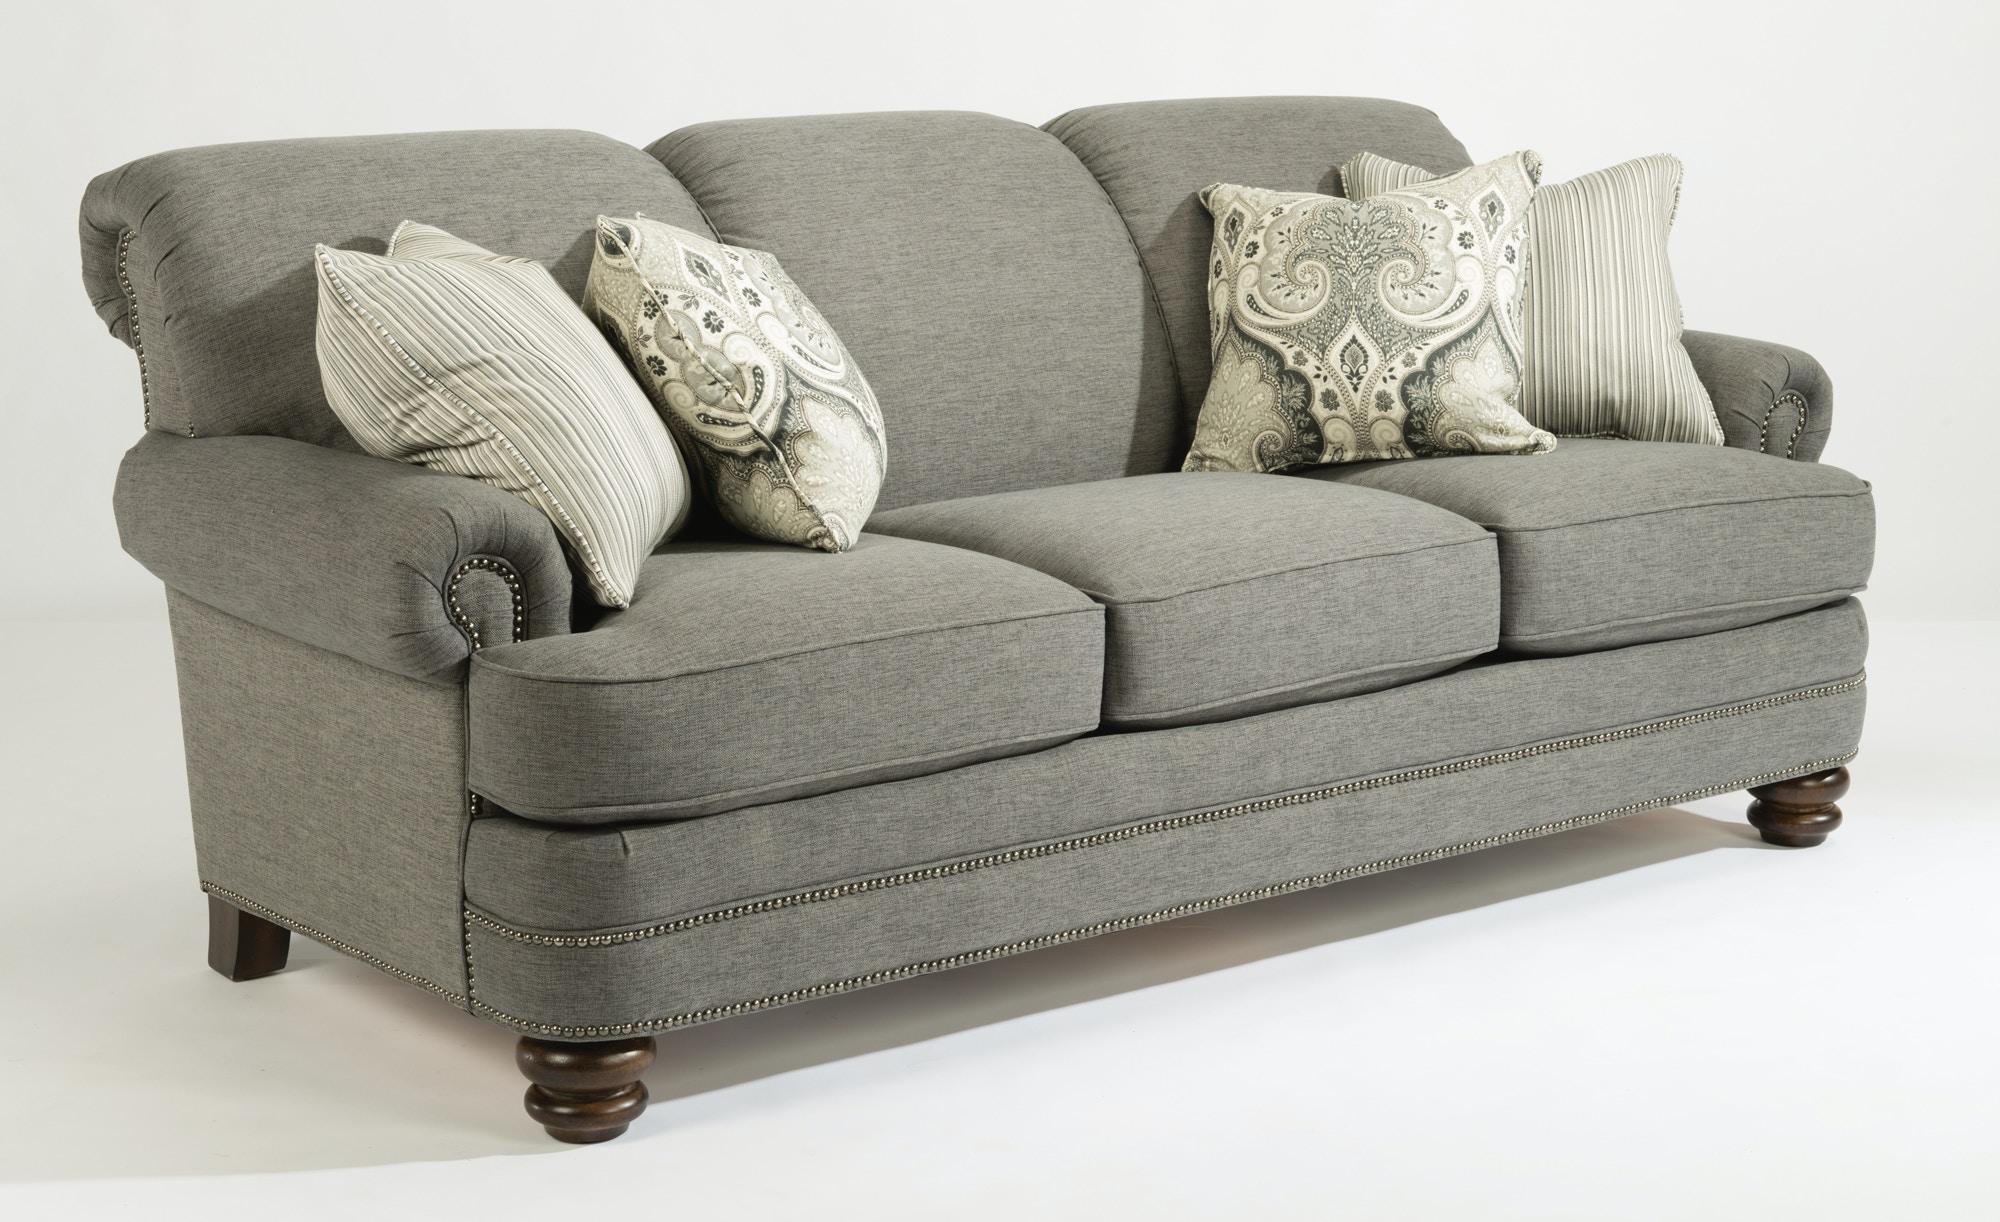 Flexsteel Sofa with Pillows 657955 Talsma Furniture Hudsonville